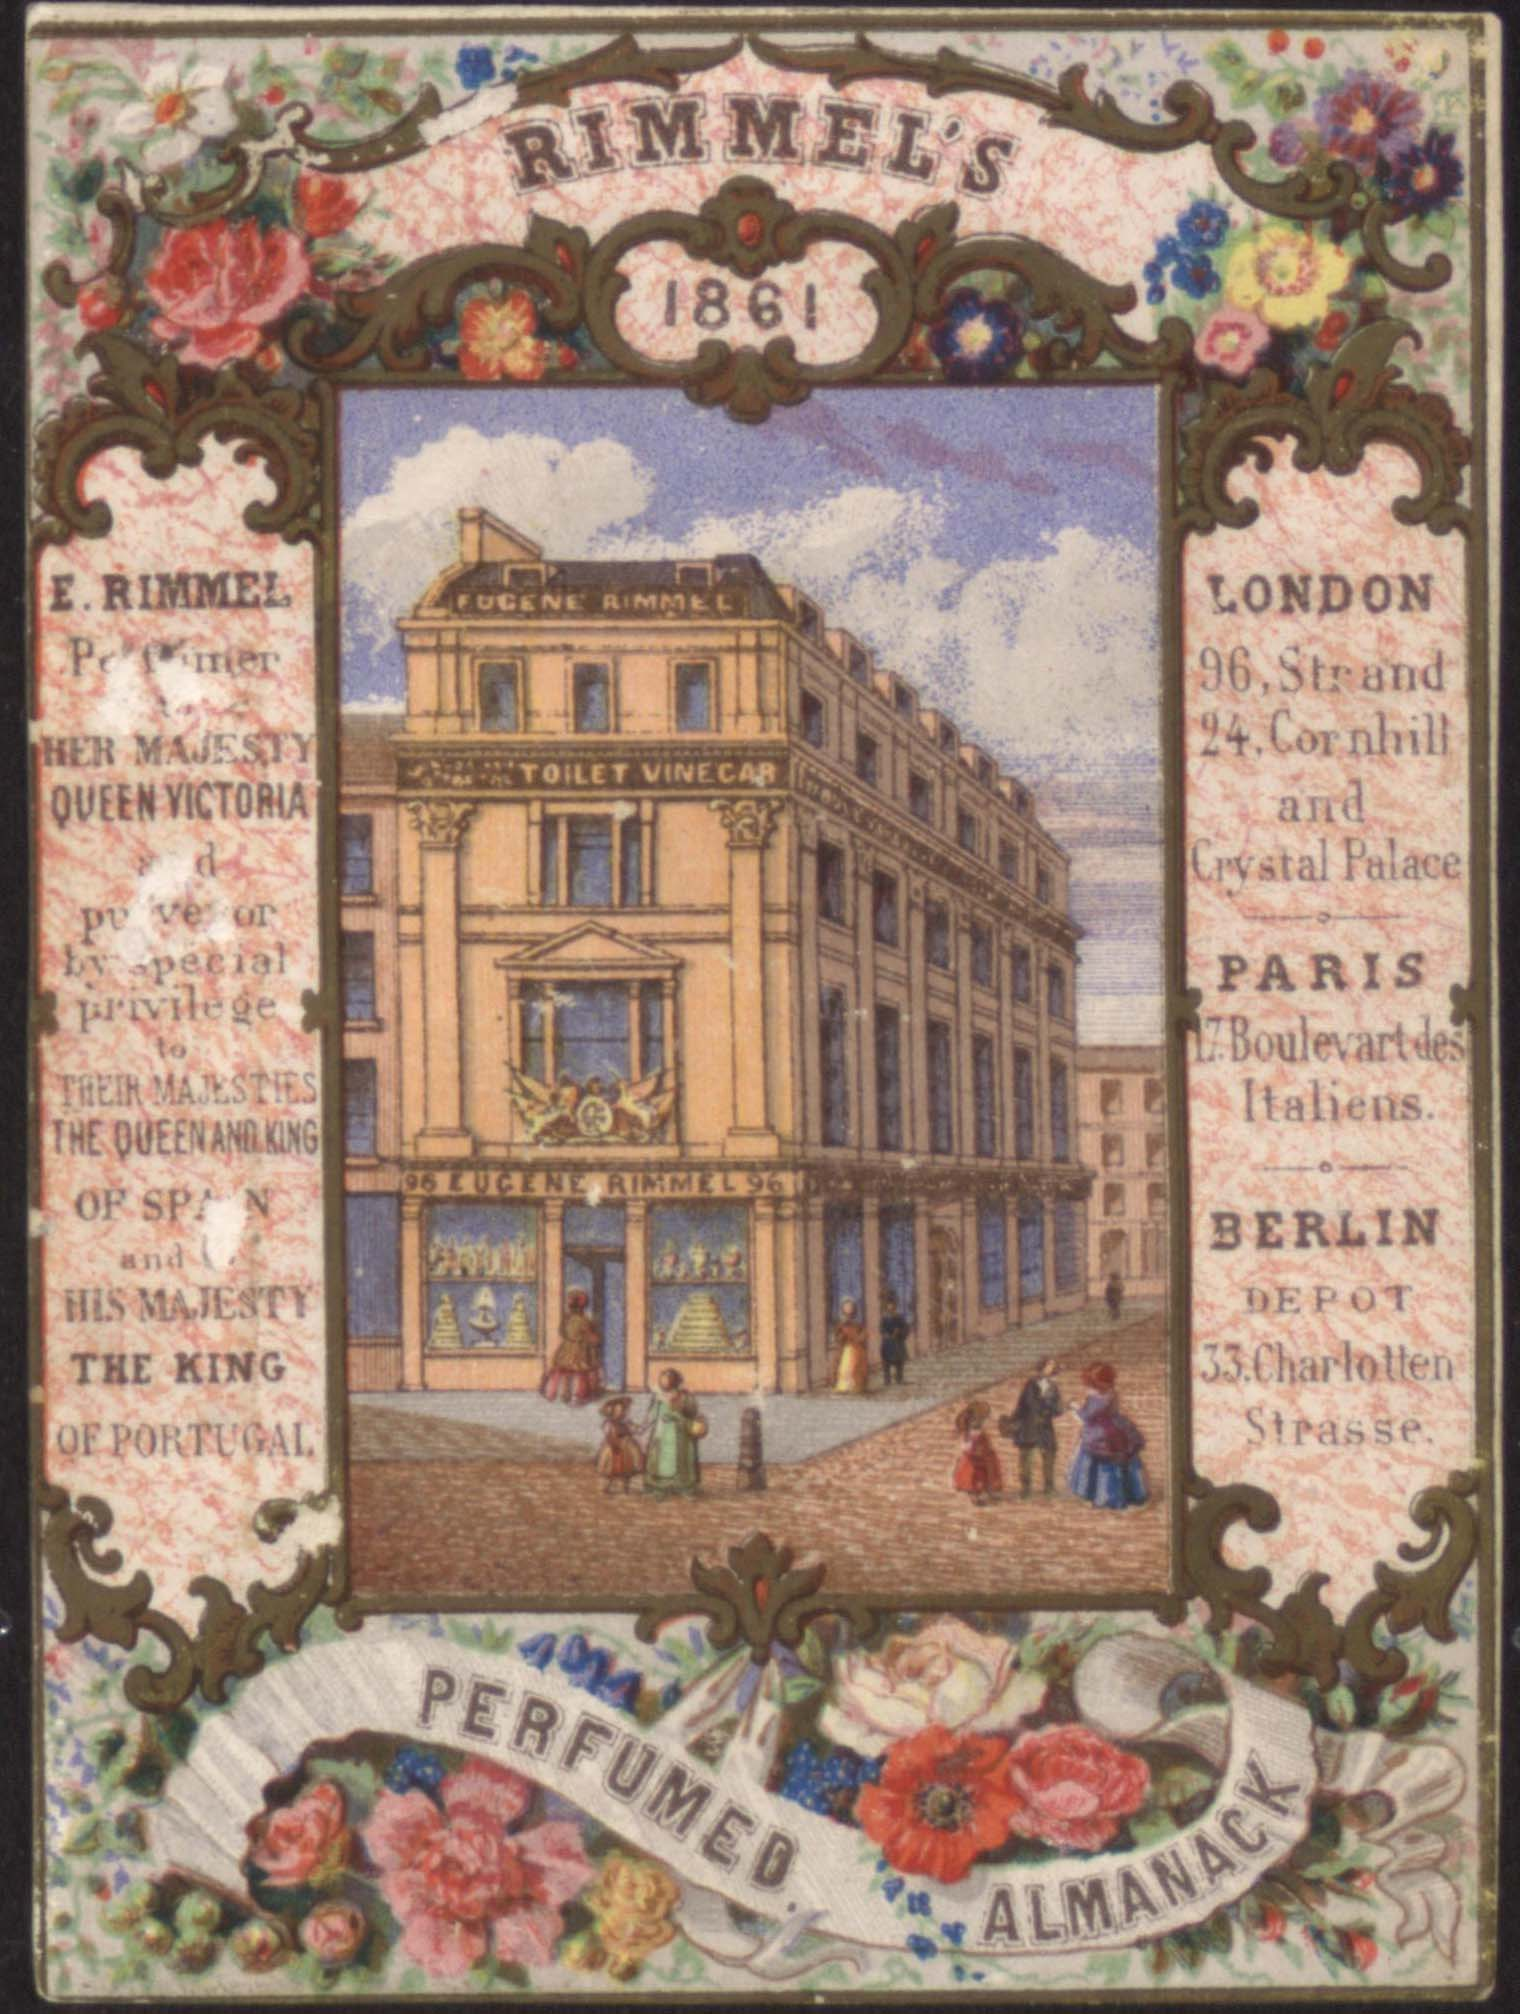 Rimmel's premises, 1861